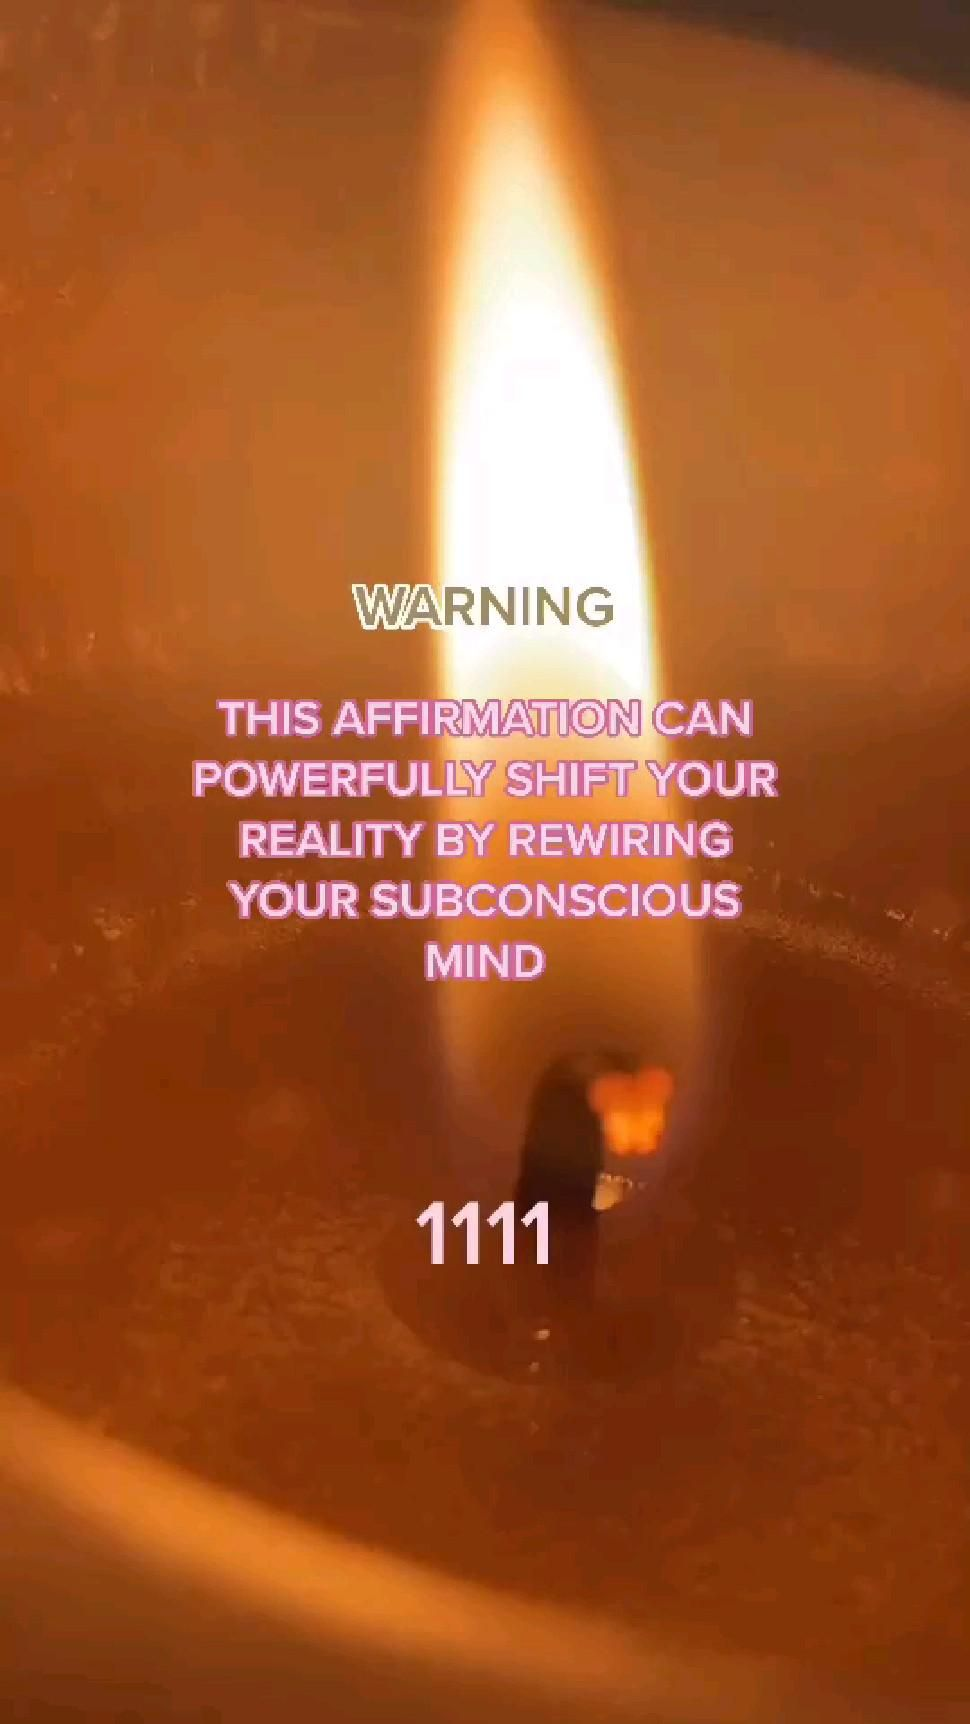 #affirmation #subconsciousmind